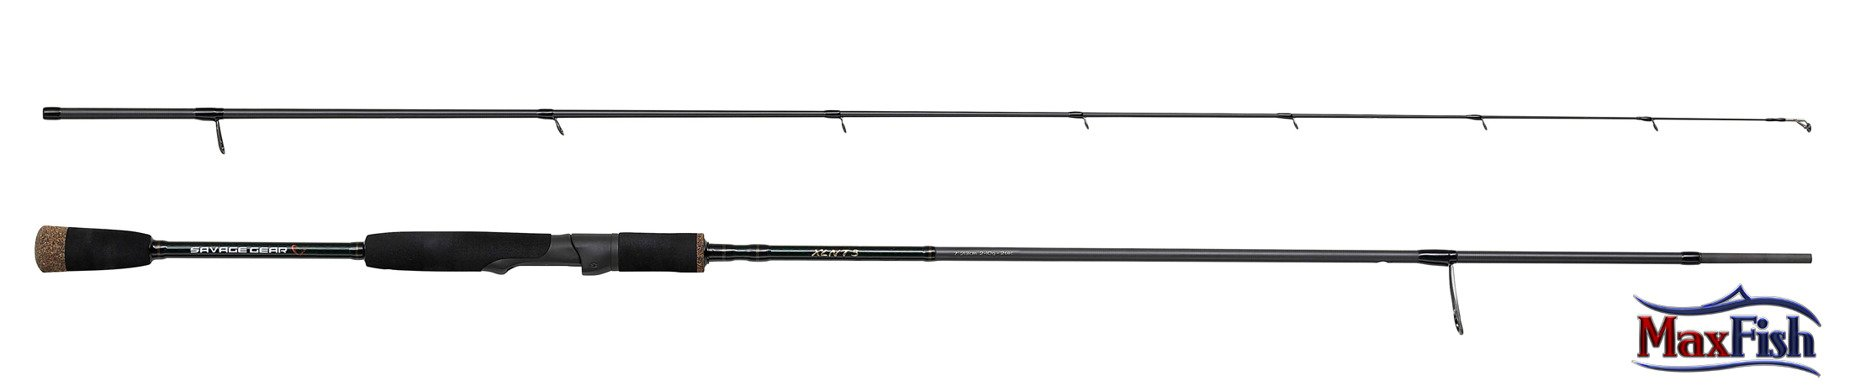 Savage Gear Xlnt3 213cm 5-18g